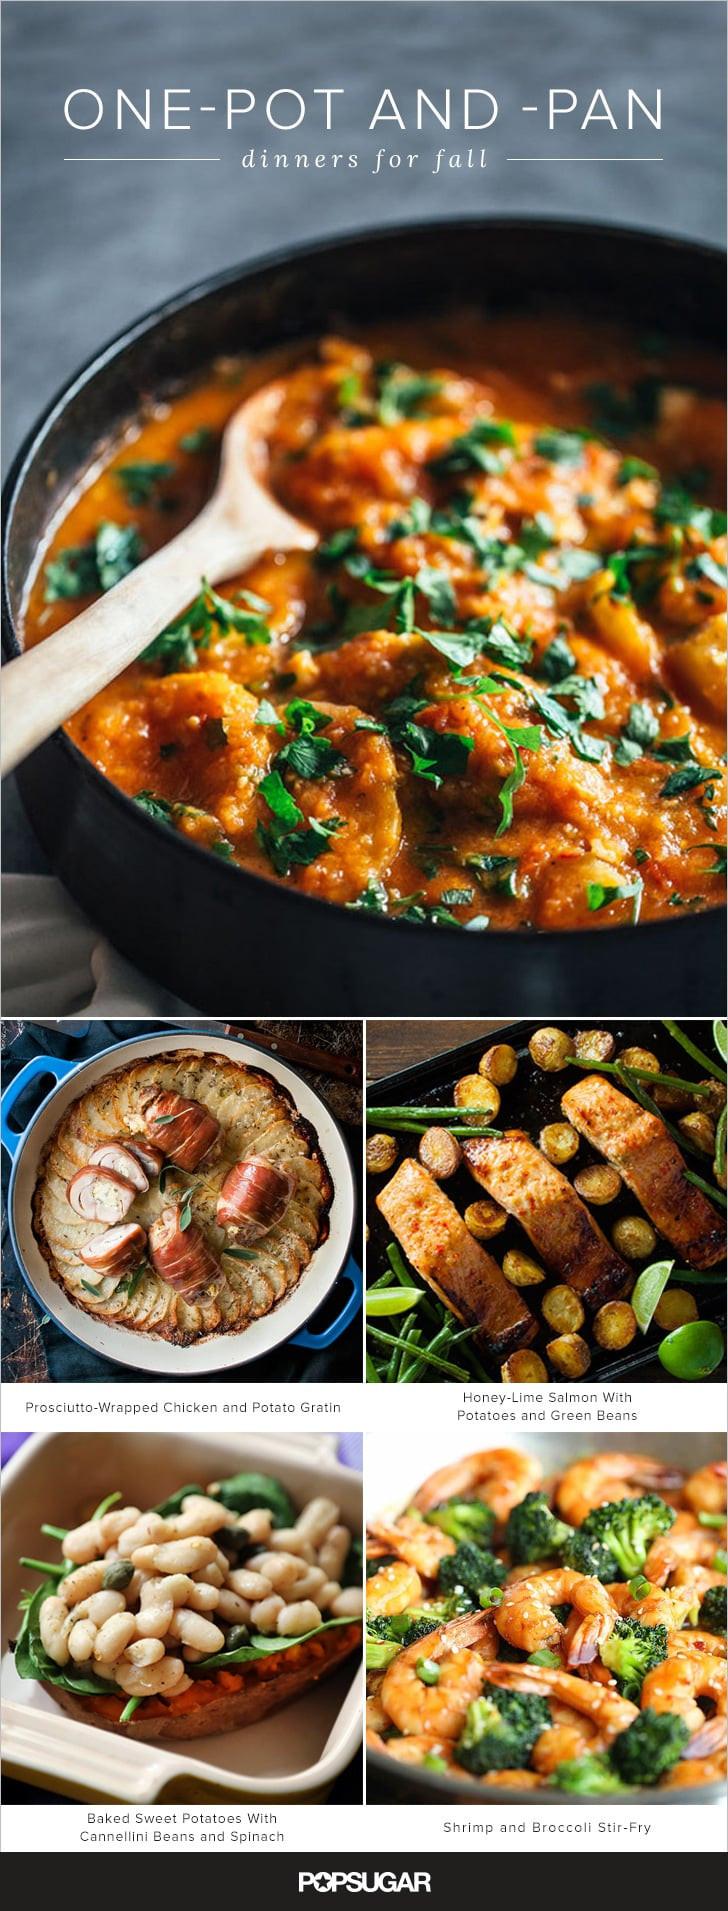 Fall Recipes Dinner  e Pot Fall Dinner Recipes